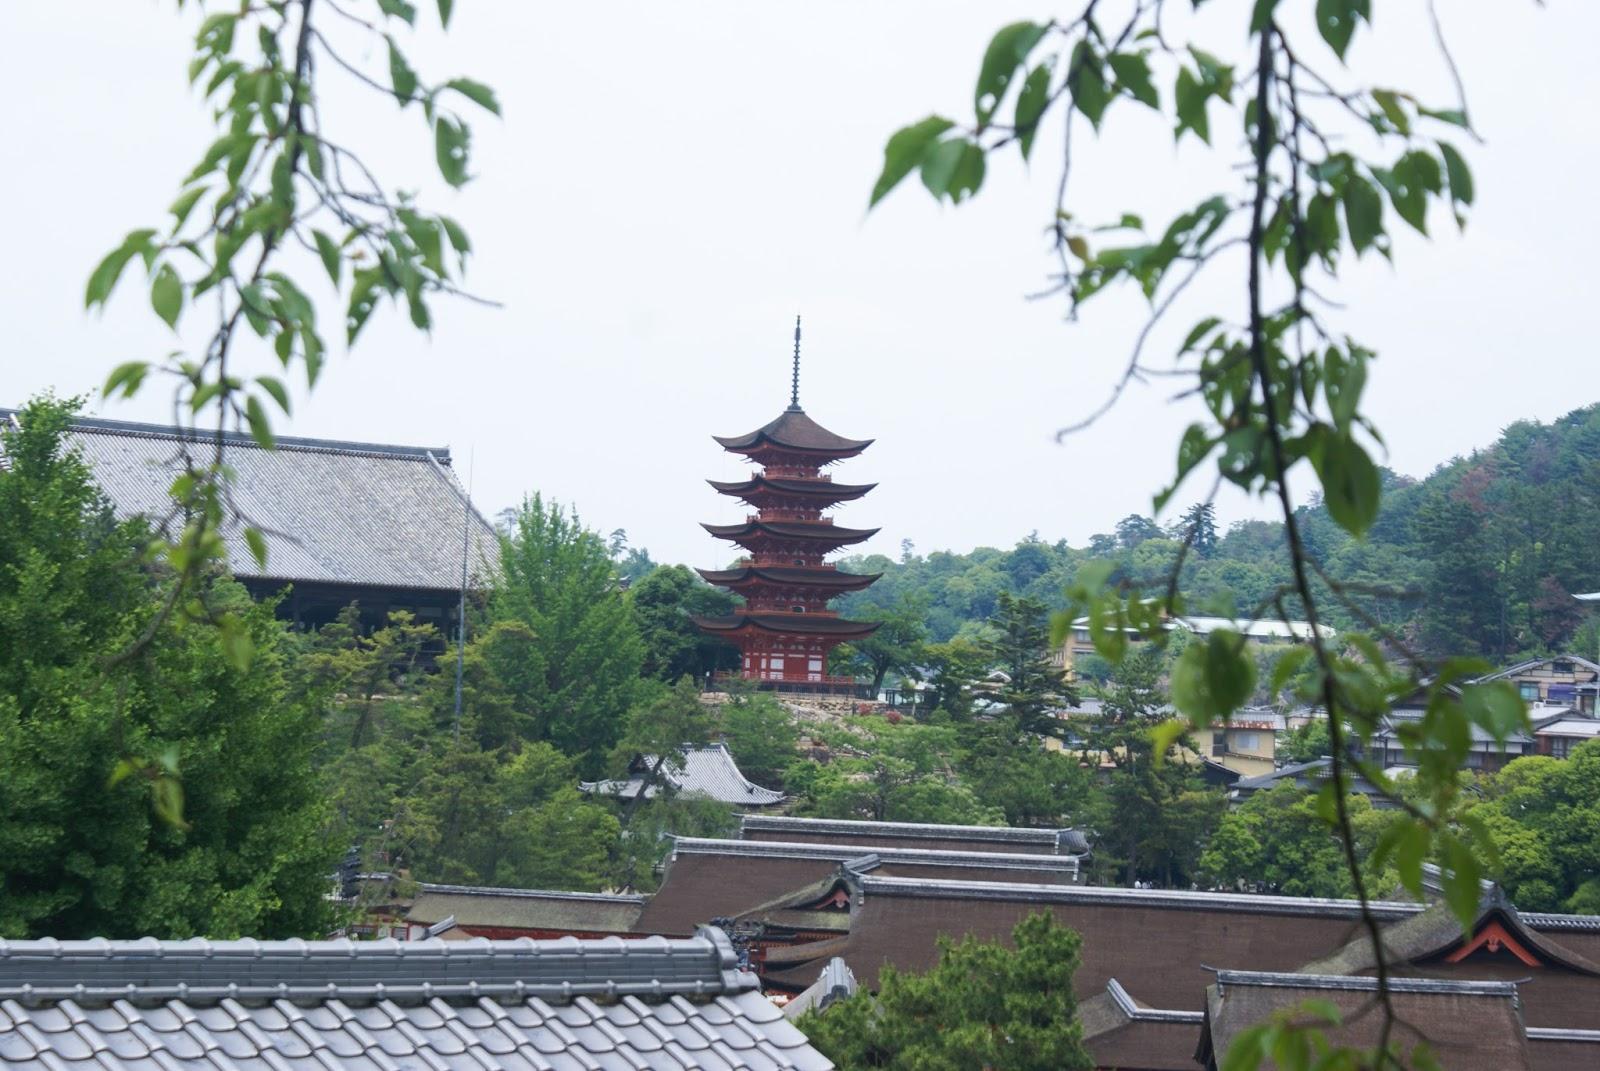 miyajima itsukushima torii roof pagoda gojunoto japan